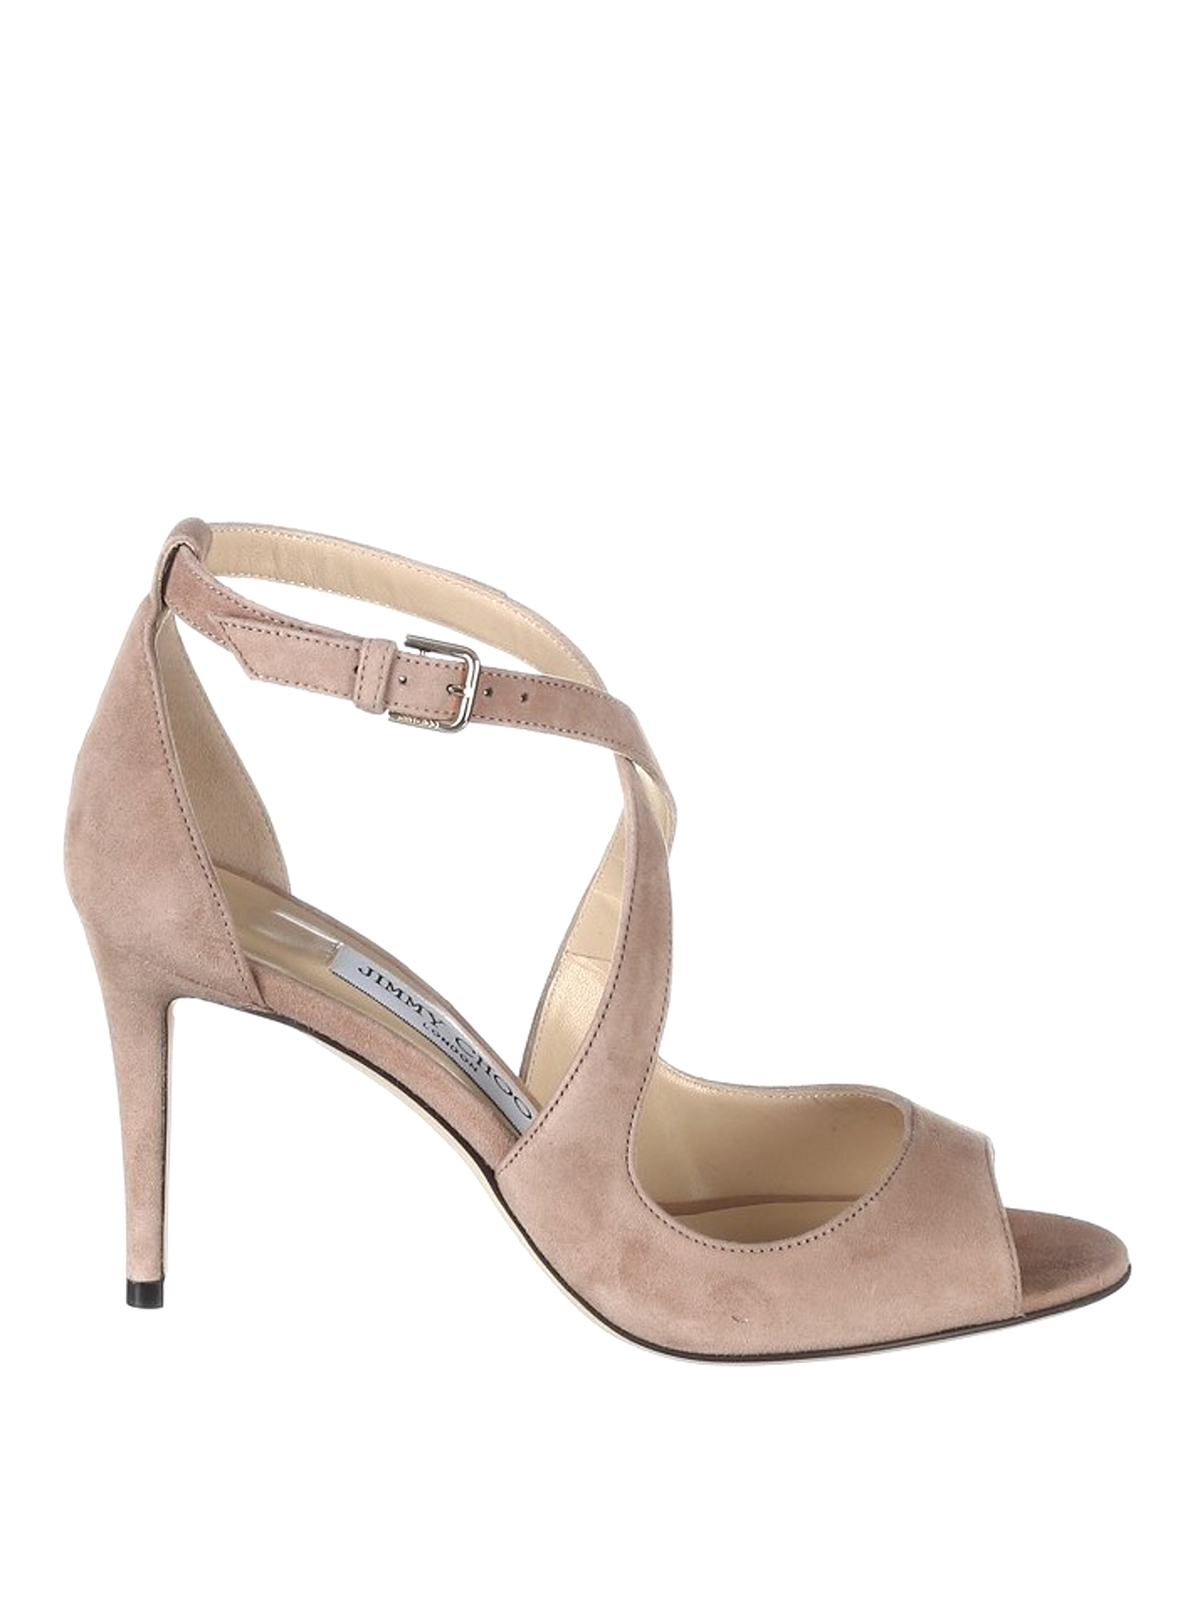 Emily 85 sandals - Brown Jimmy Choo London inRDFH